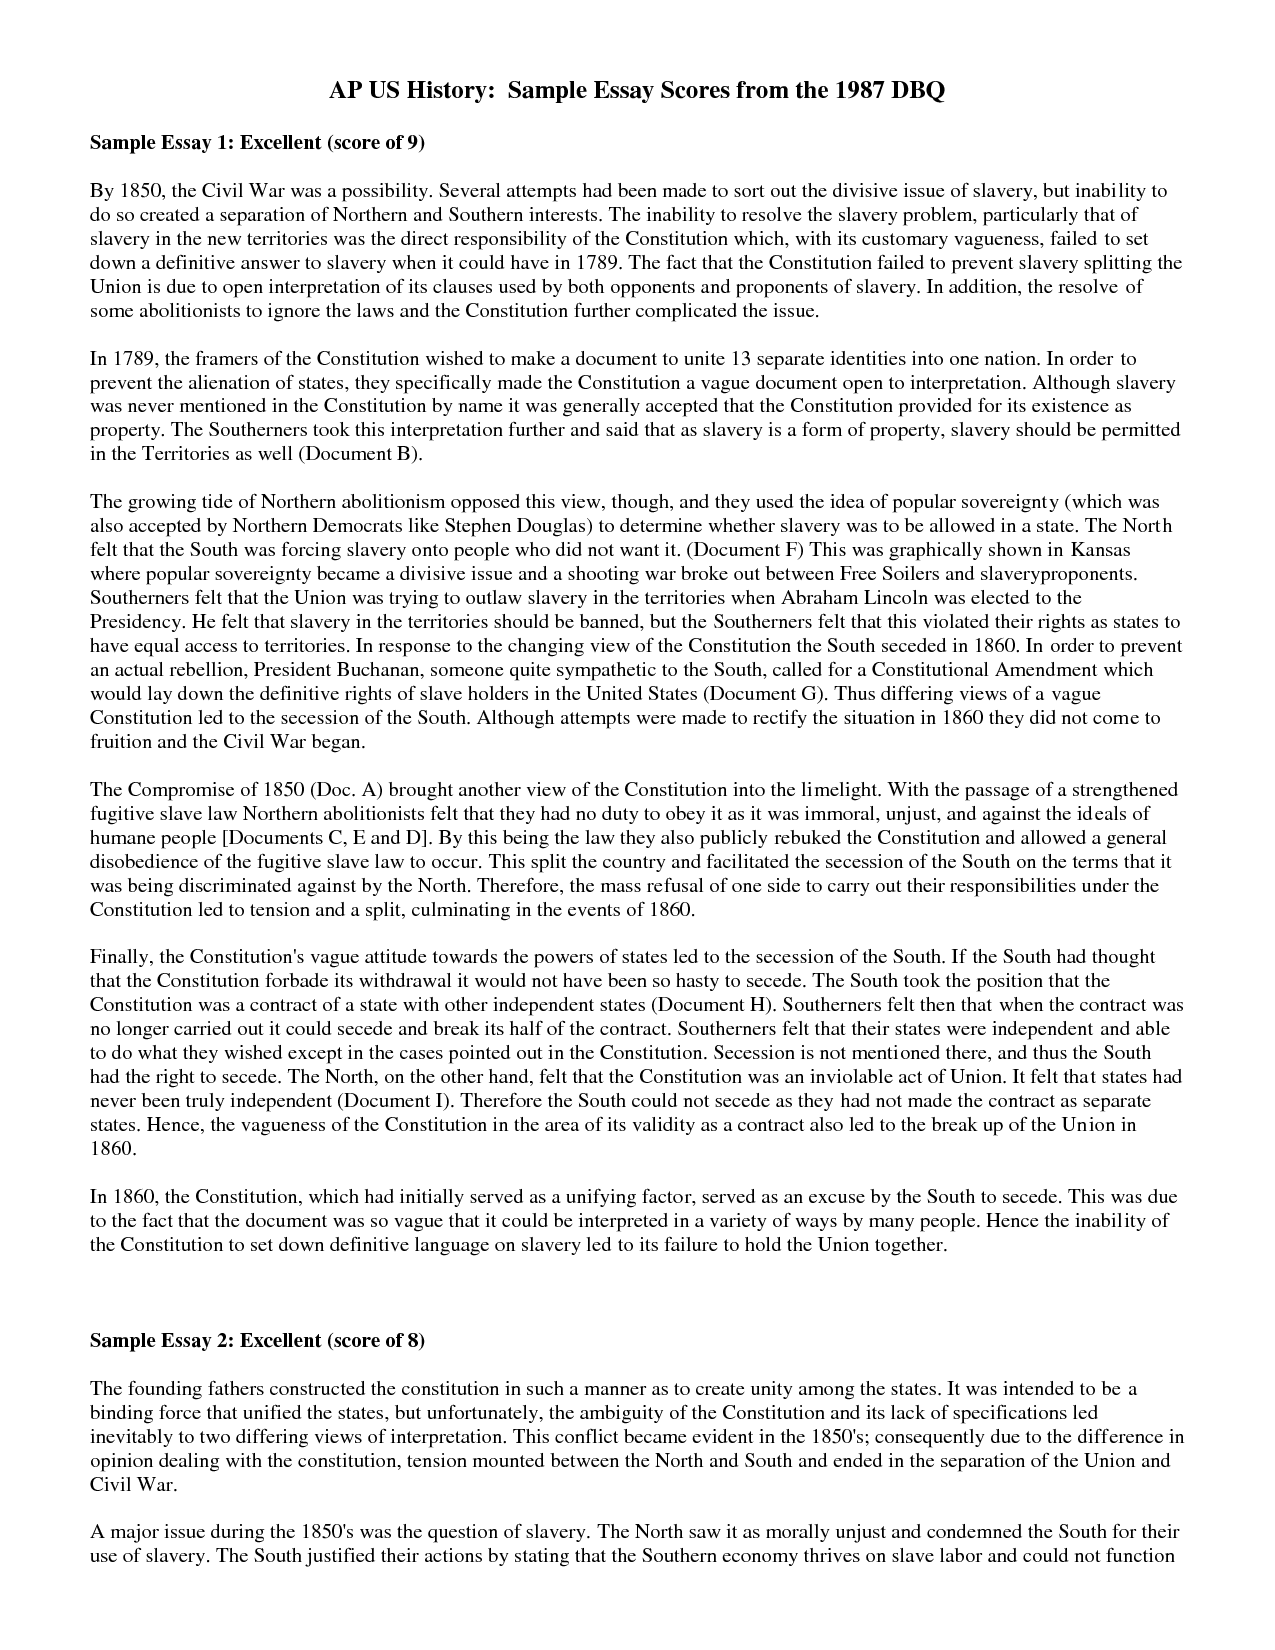 dbq essay outline